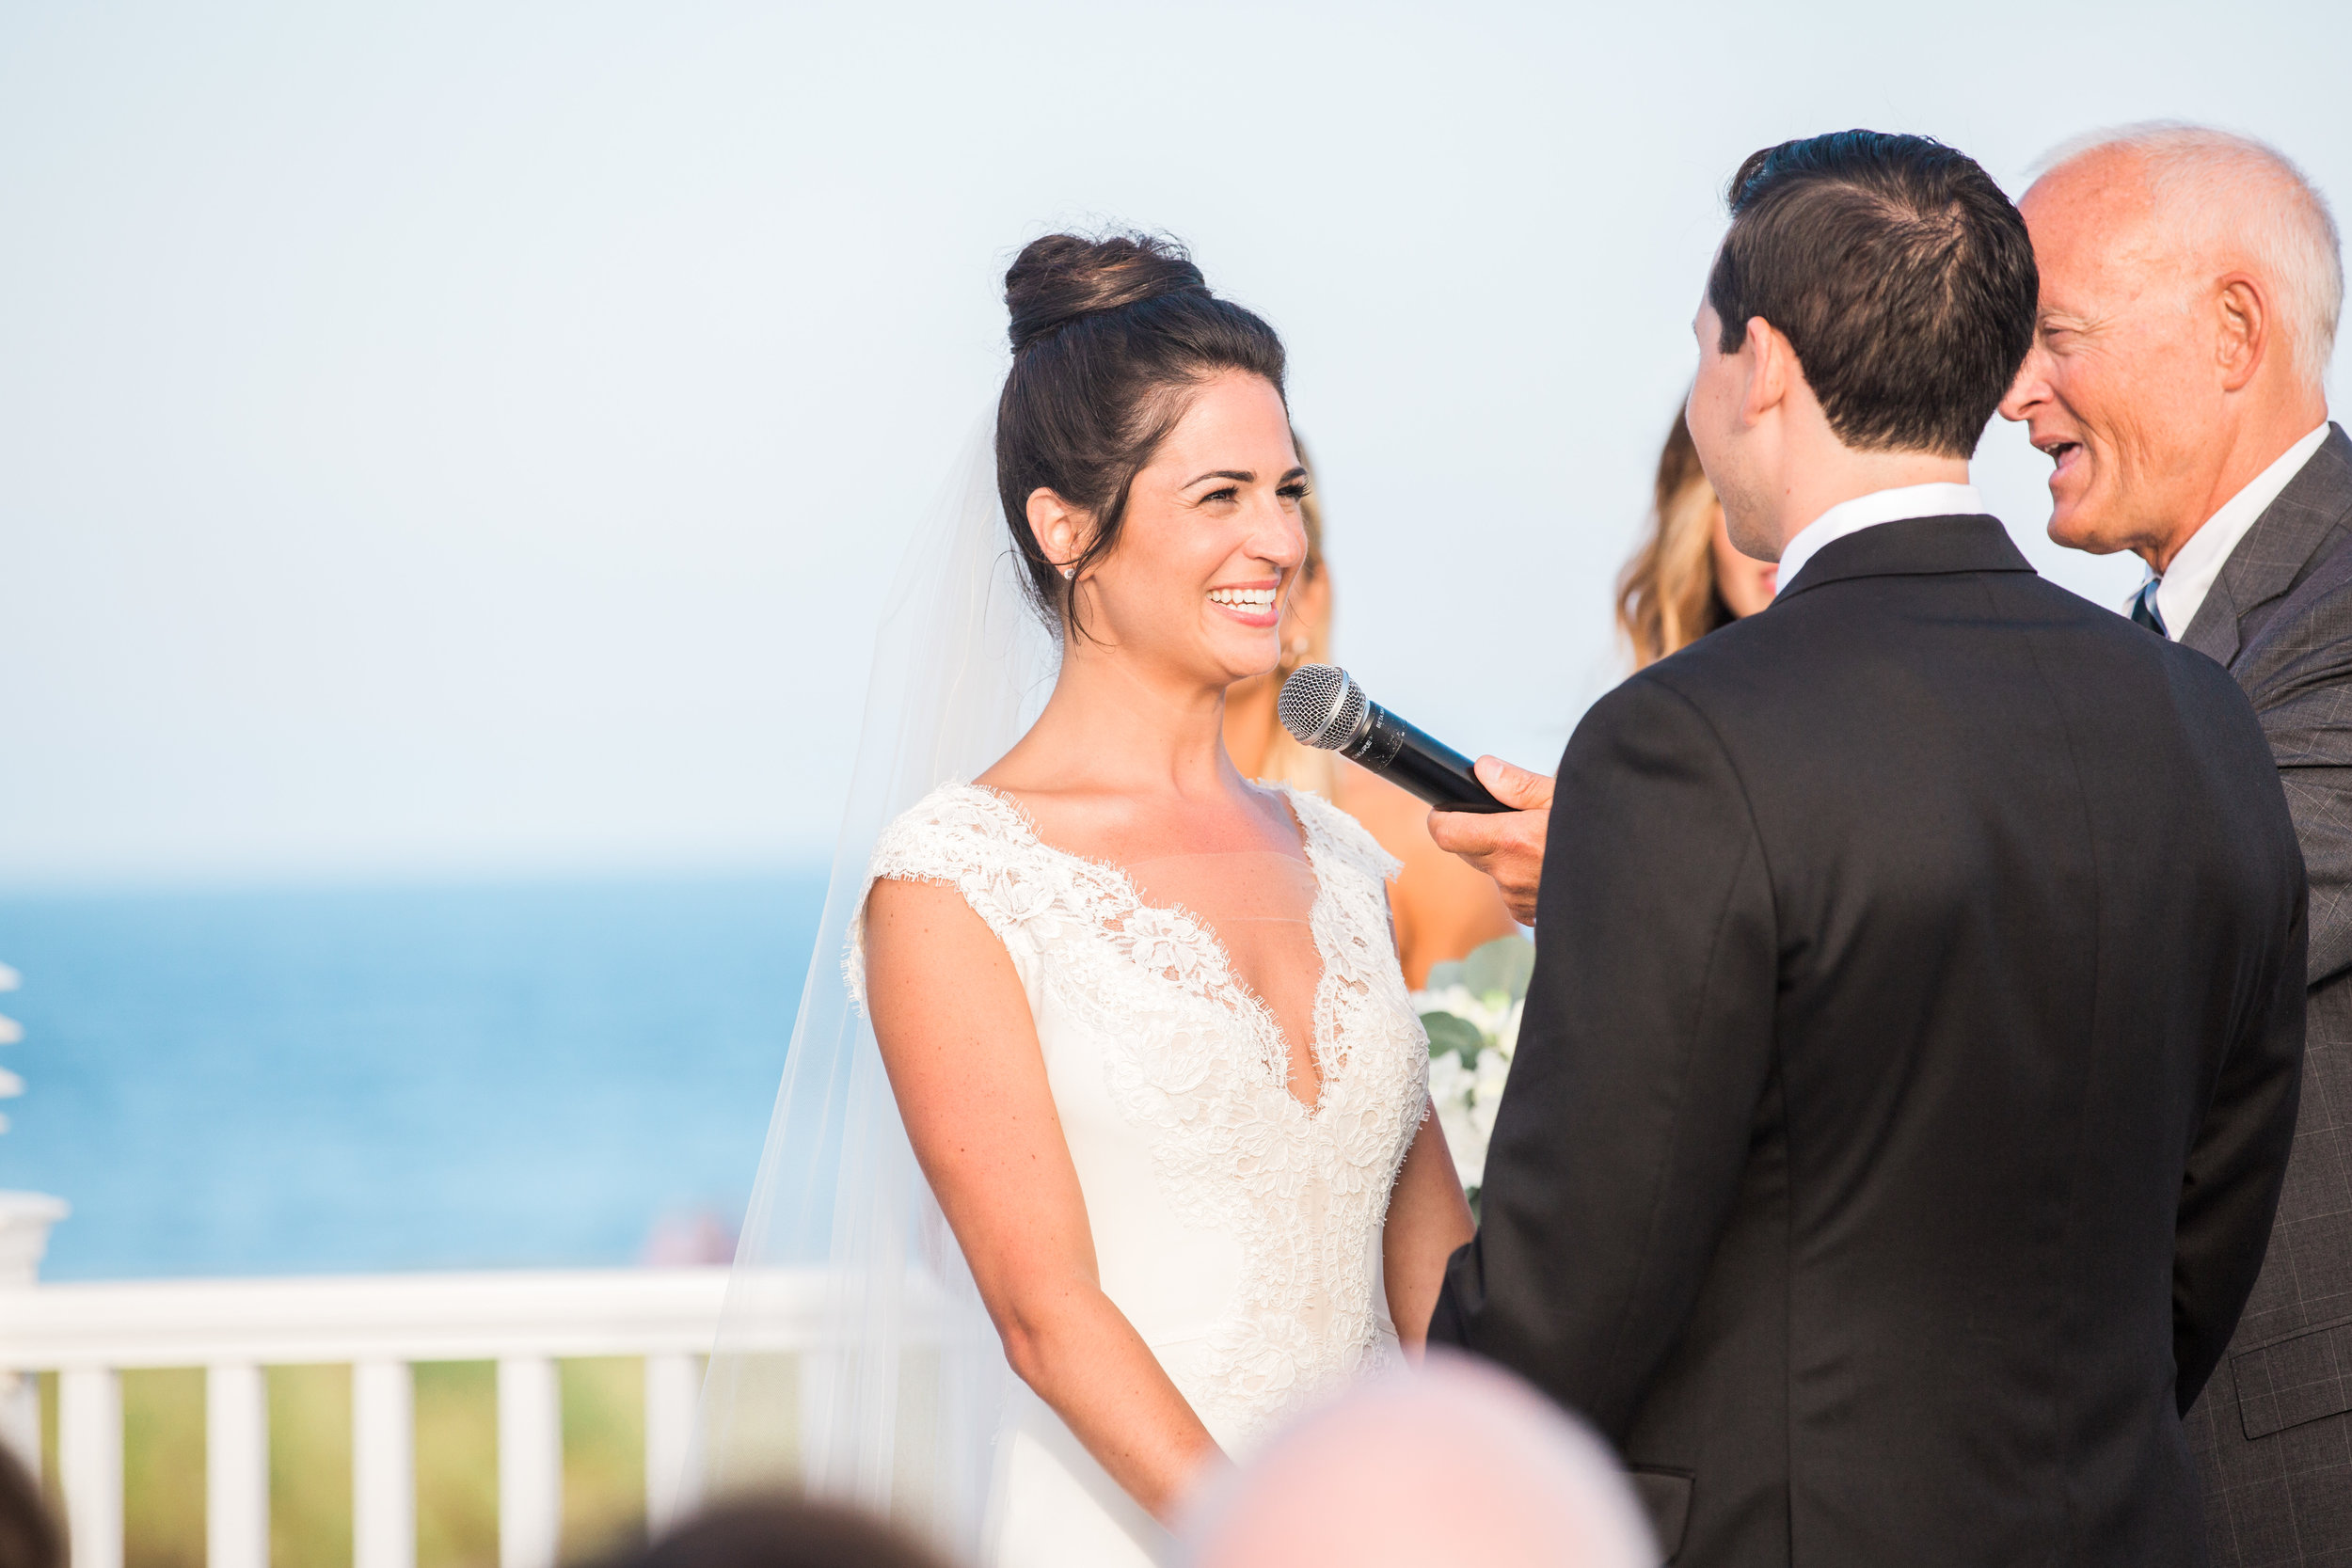 Spring-Lake-New-Jersey-Beach-Wedding-Photographer_270.jpg